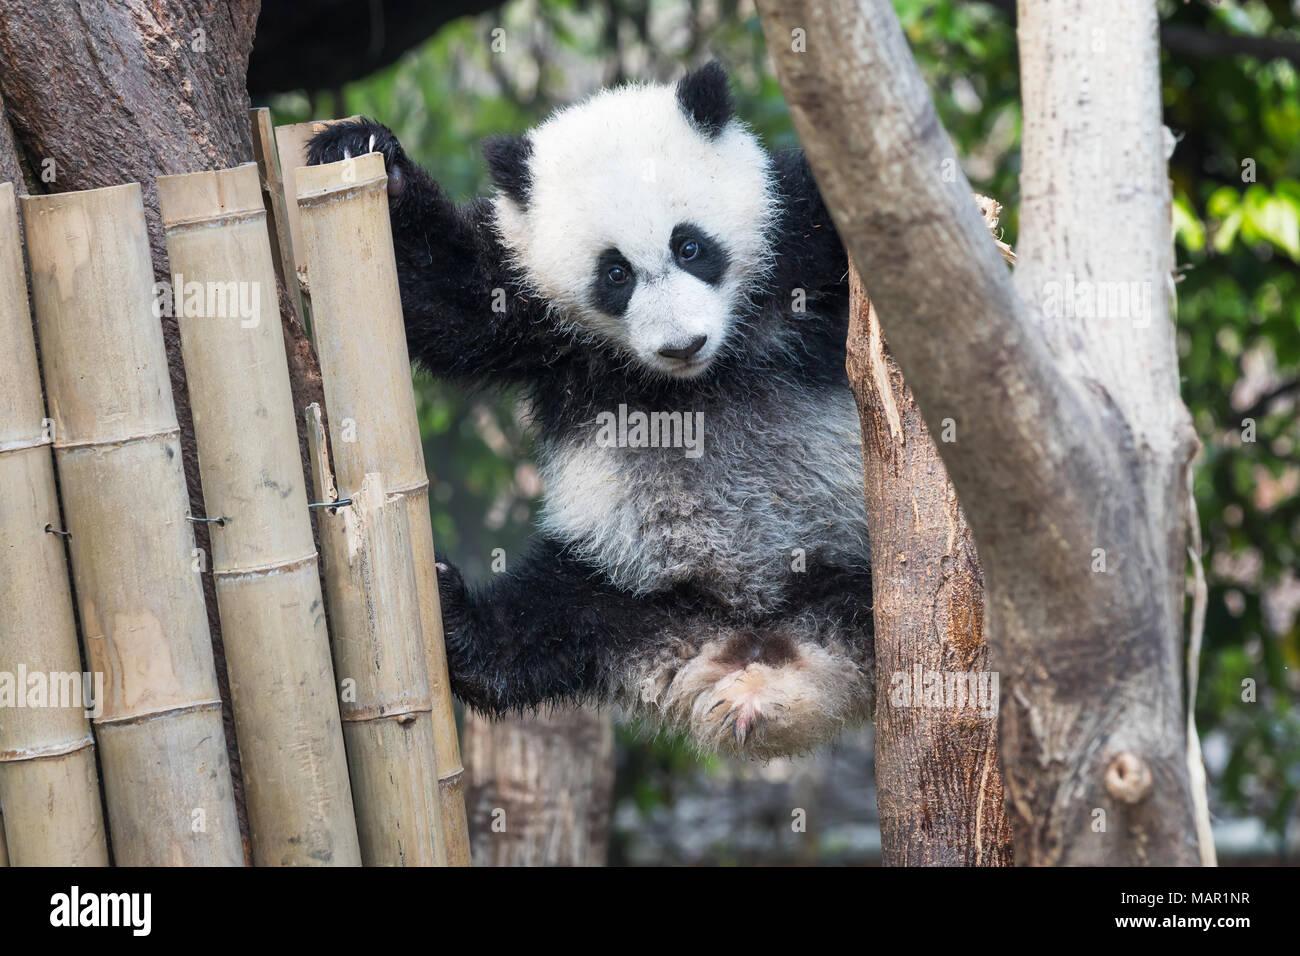 Panda cub playing in a tree, Chengdu, China - Stock Image